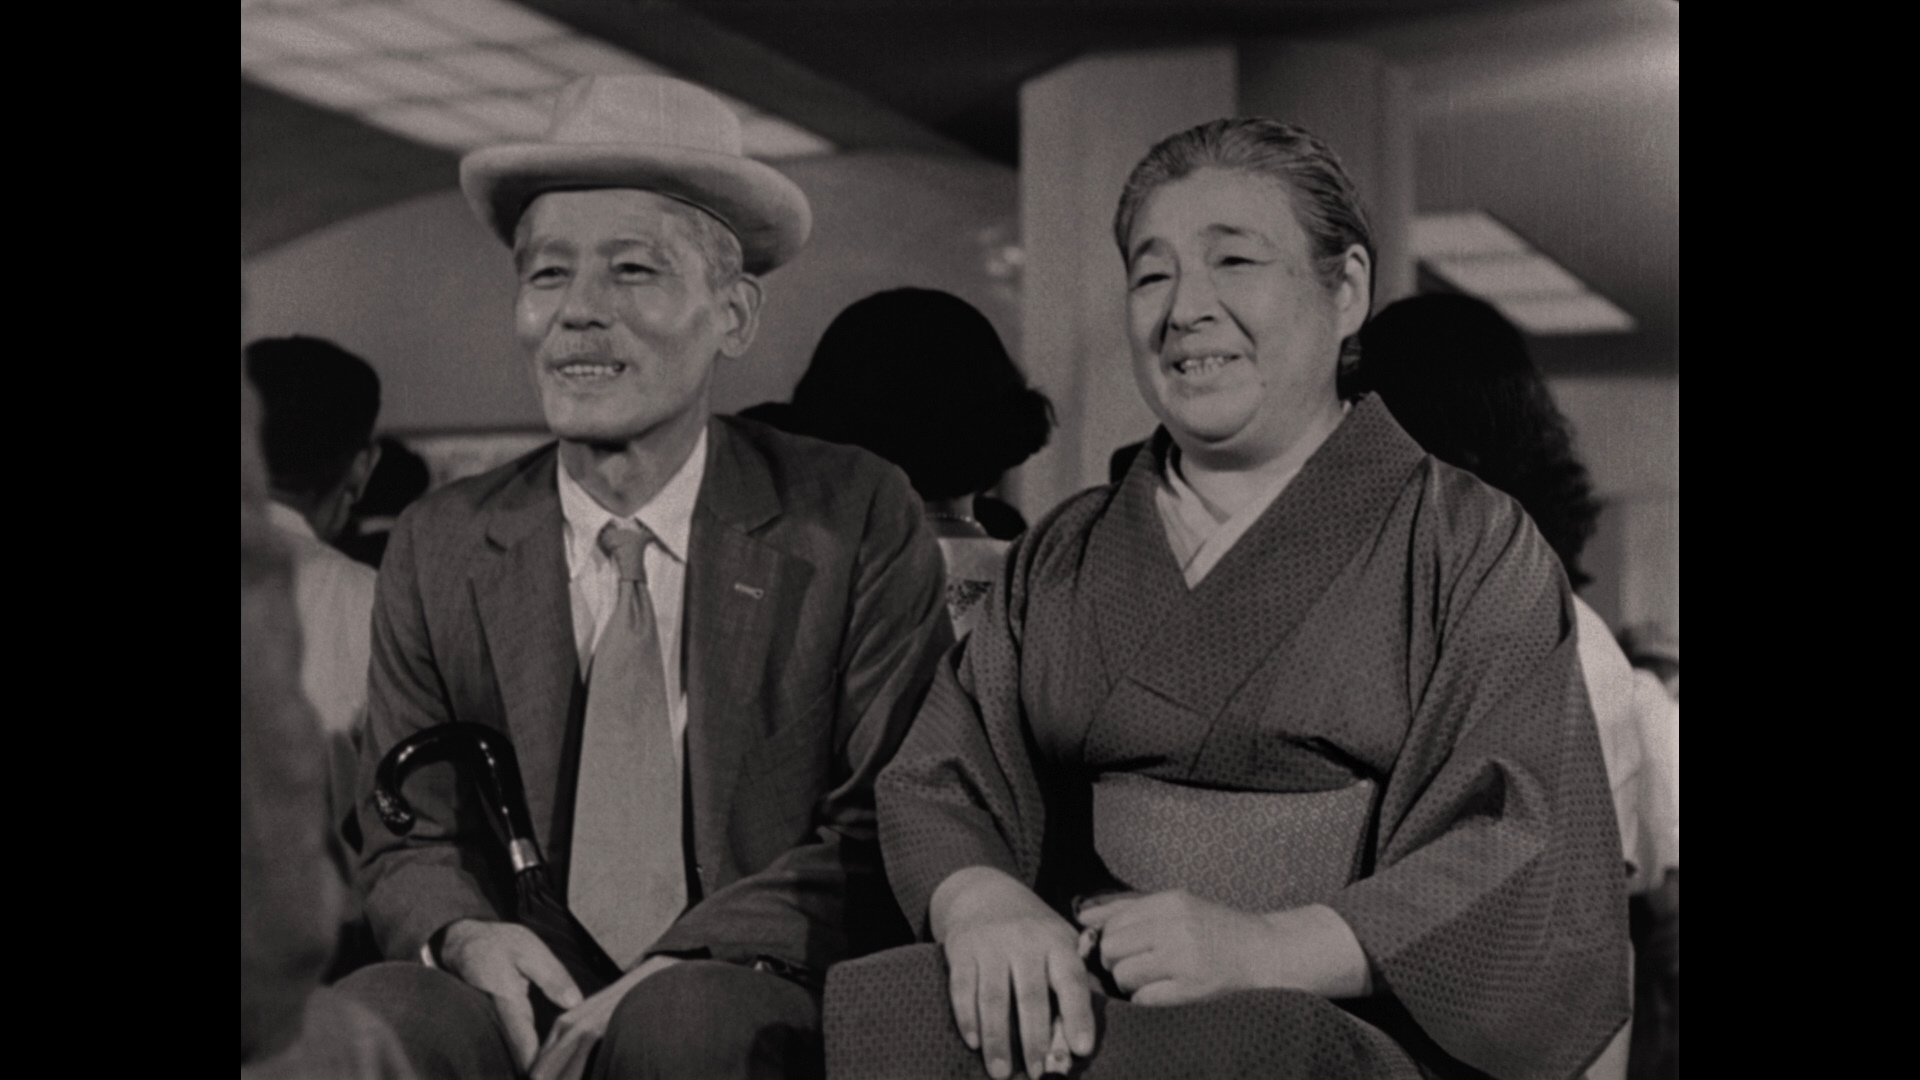 https://i2.wp.com/www.dvdbeaver.com/film4/blu-ray_reviews_59/tokyo_story_blu-ray_/large/large_tokyo_story_blu-ray_02x.jpg